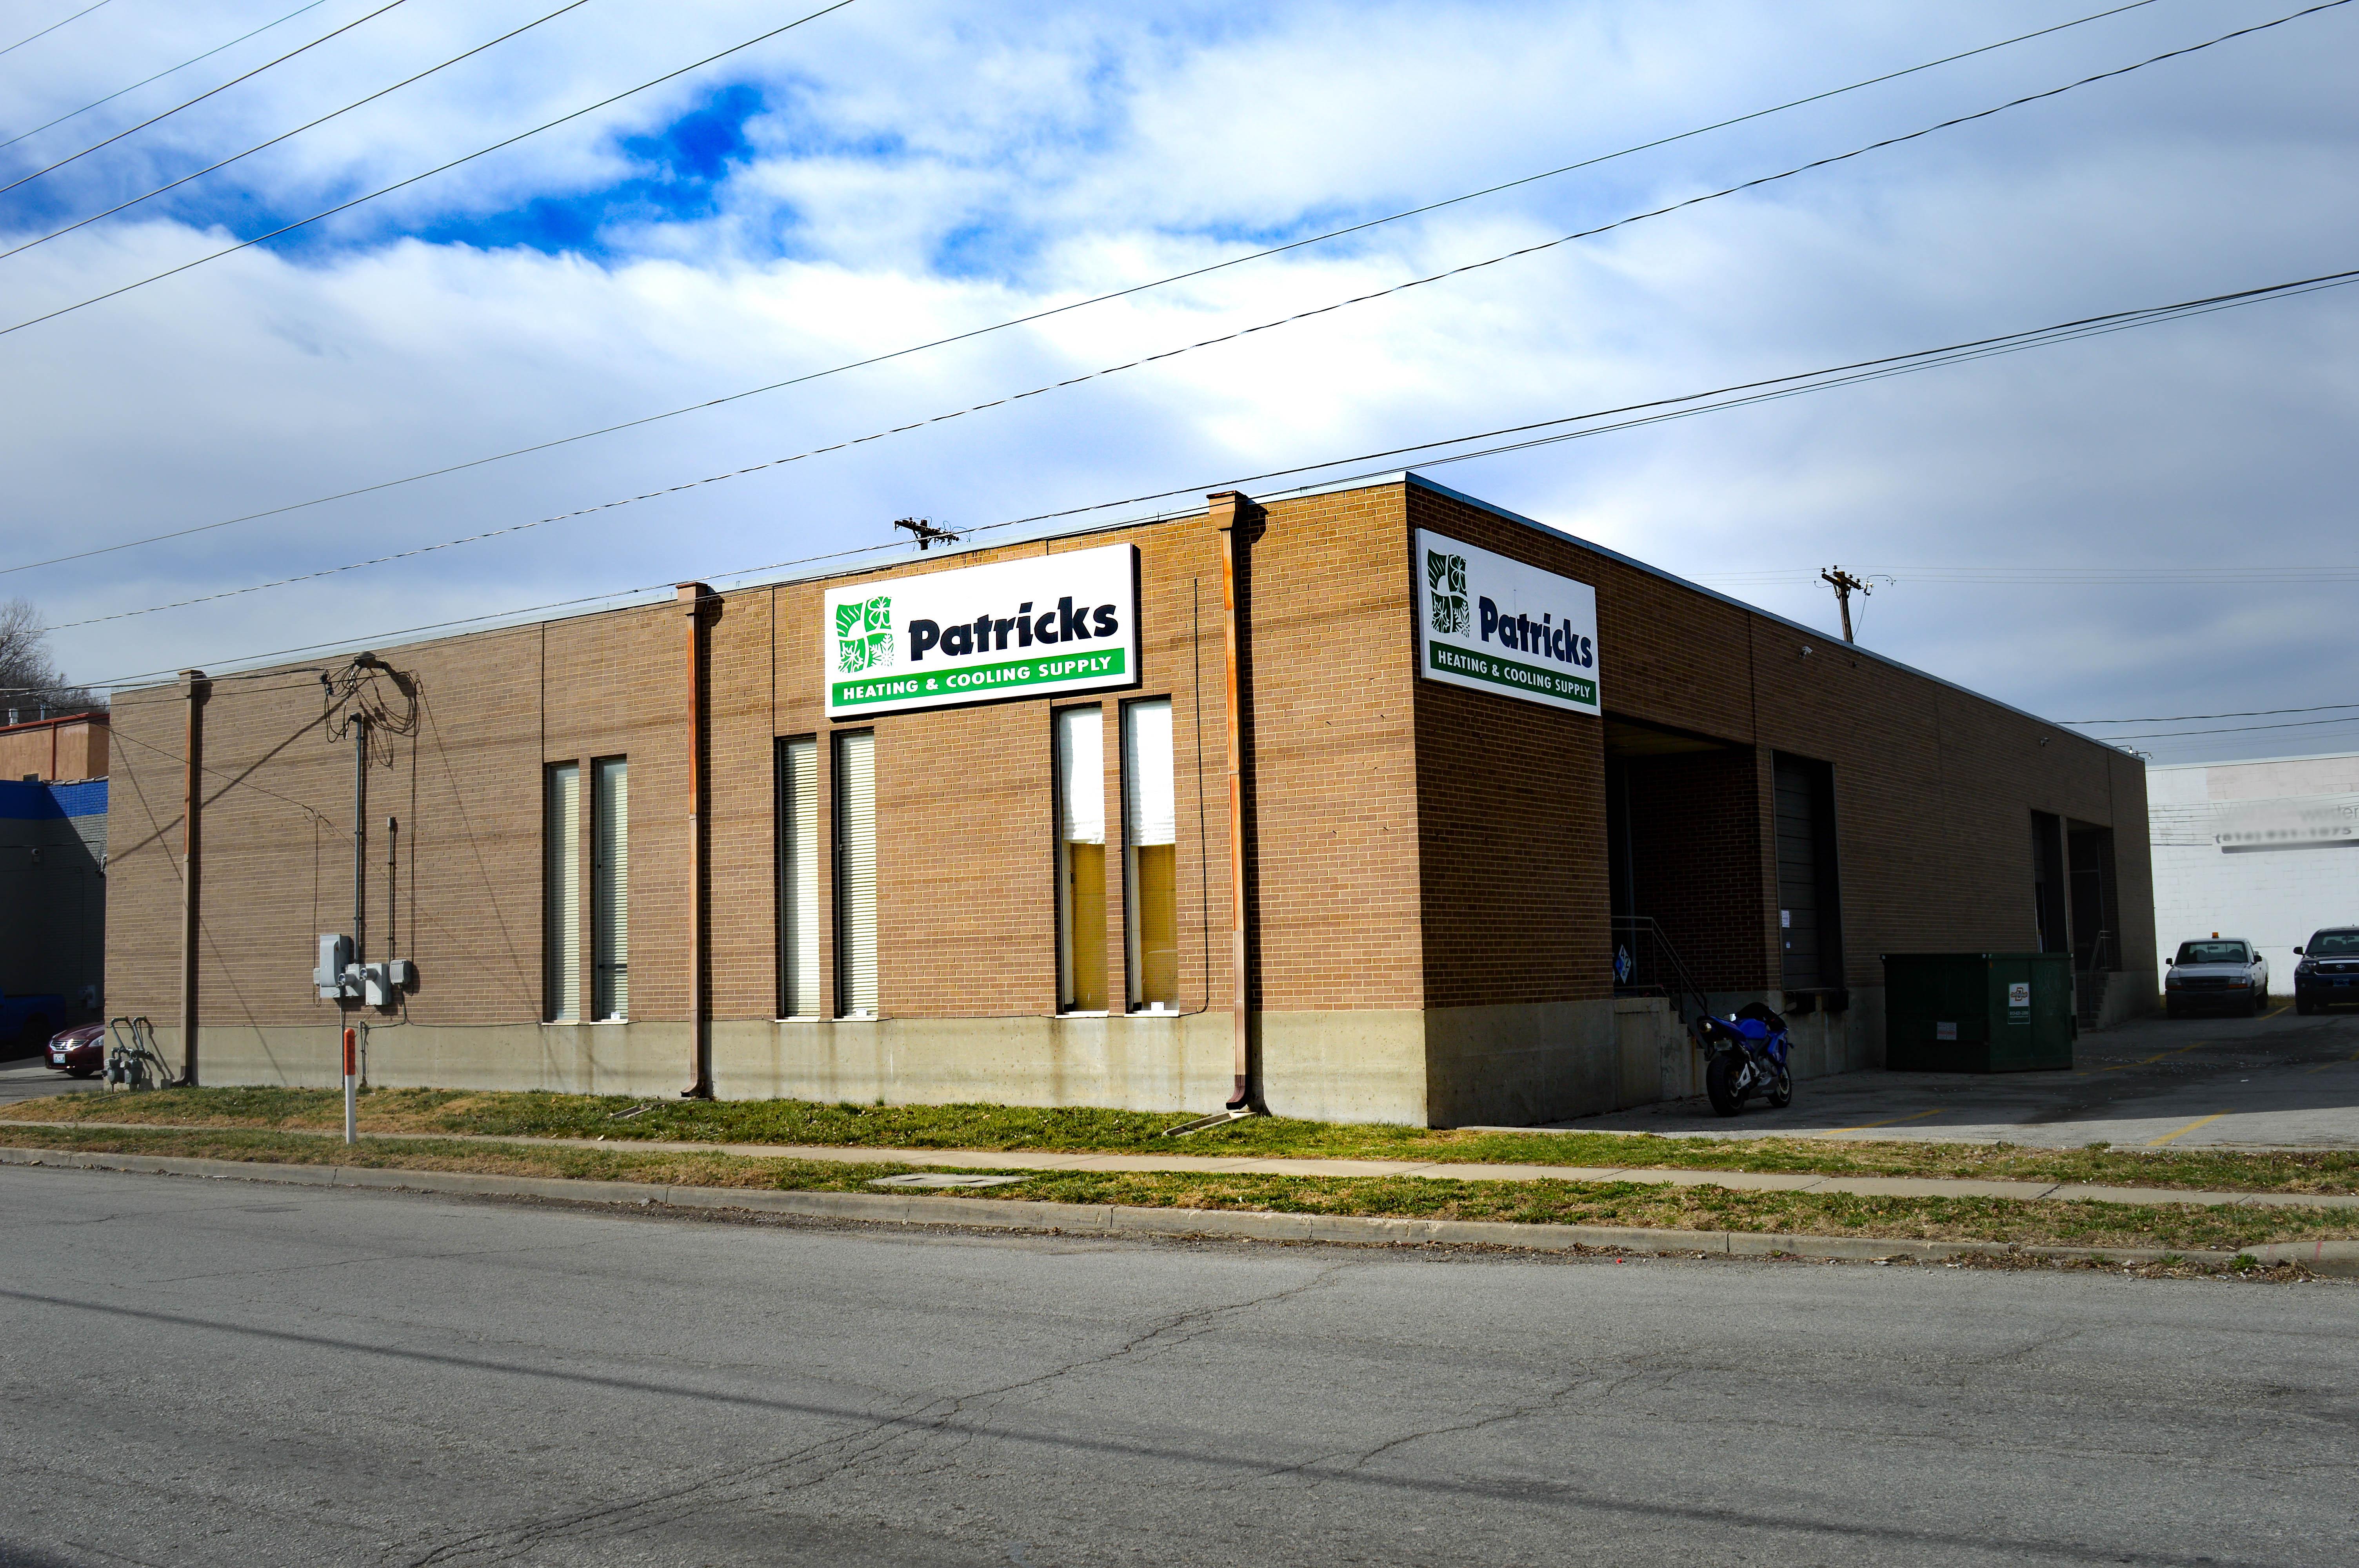 Patrick's Heating & Cooling Supply 1625 W 31st St, Kansas